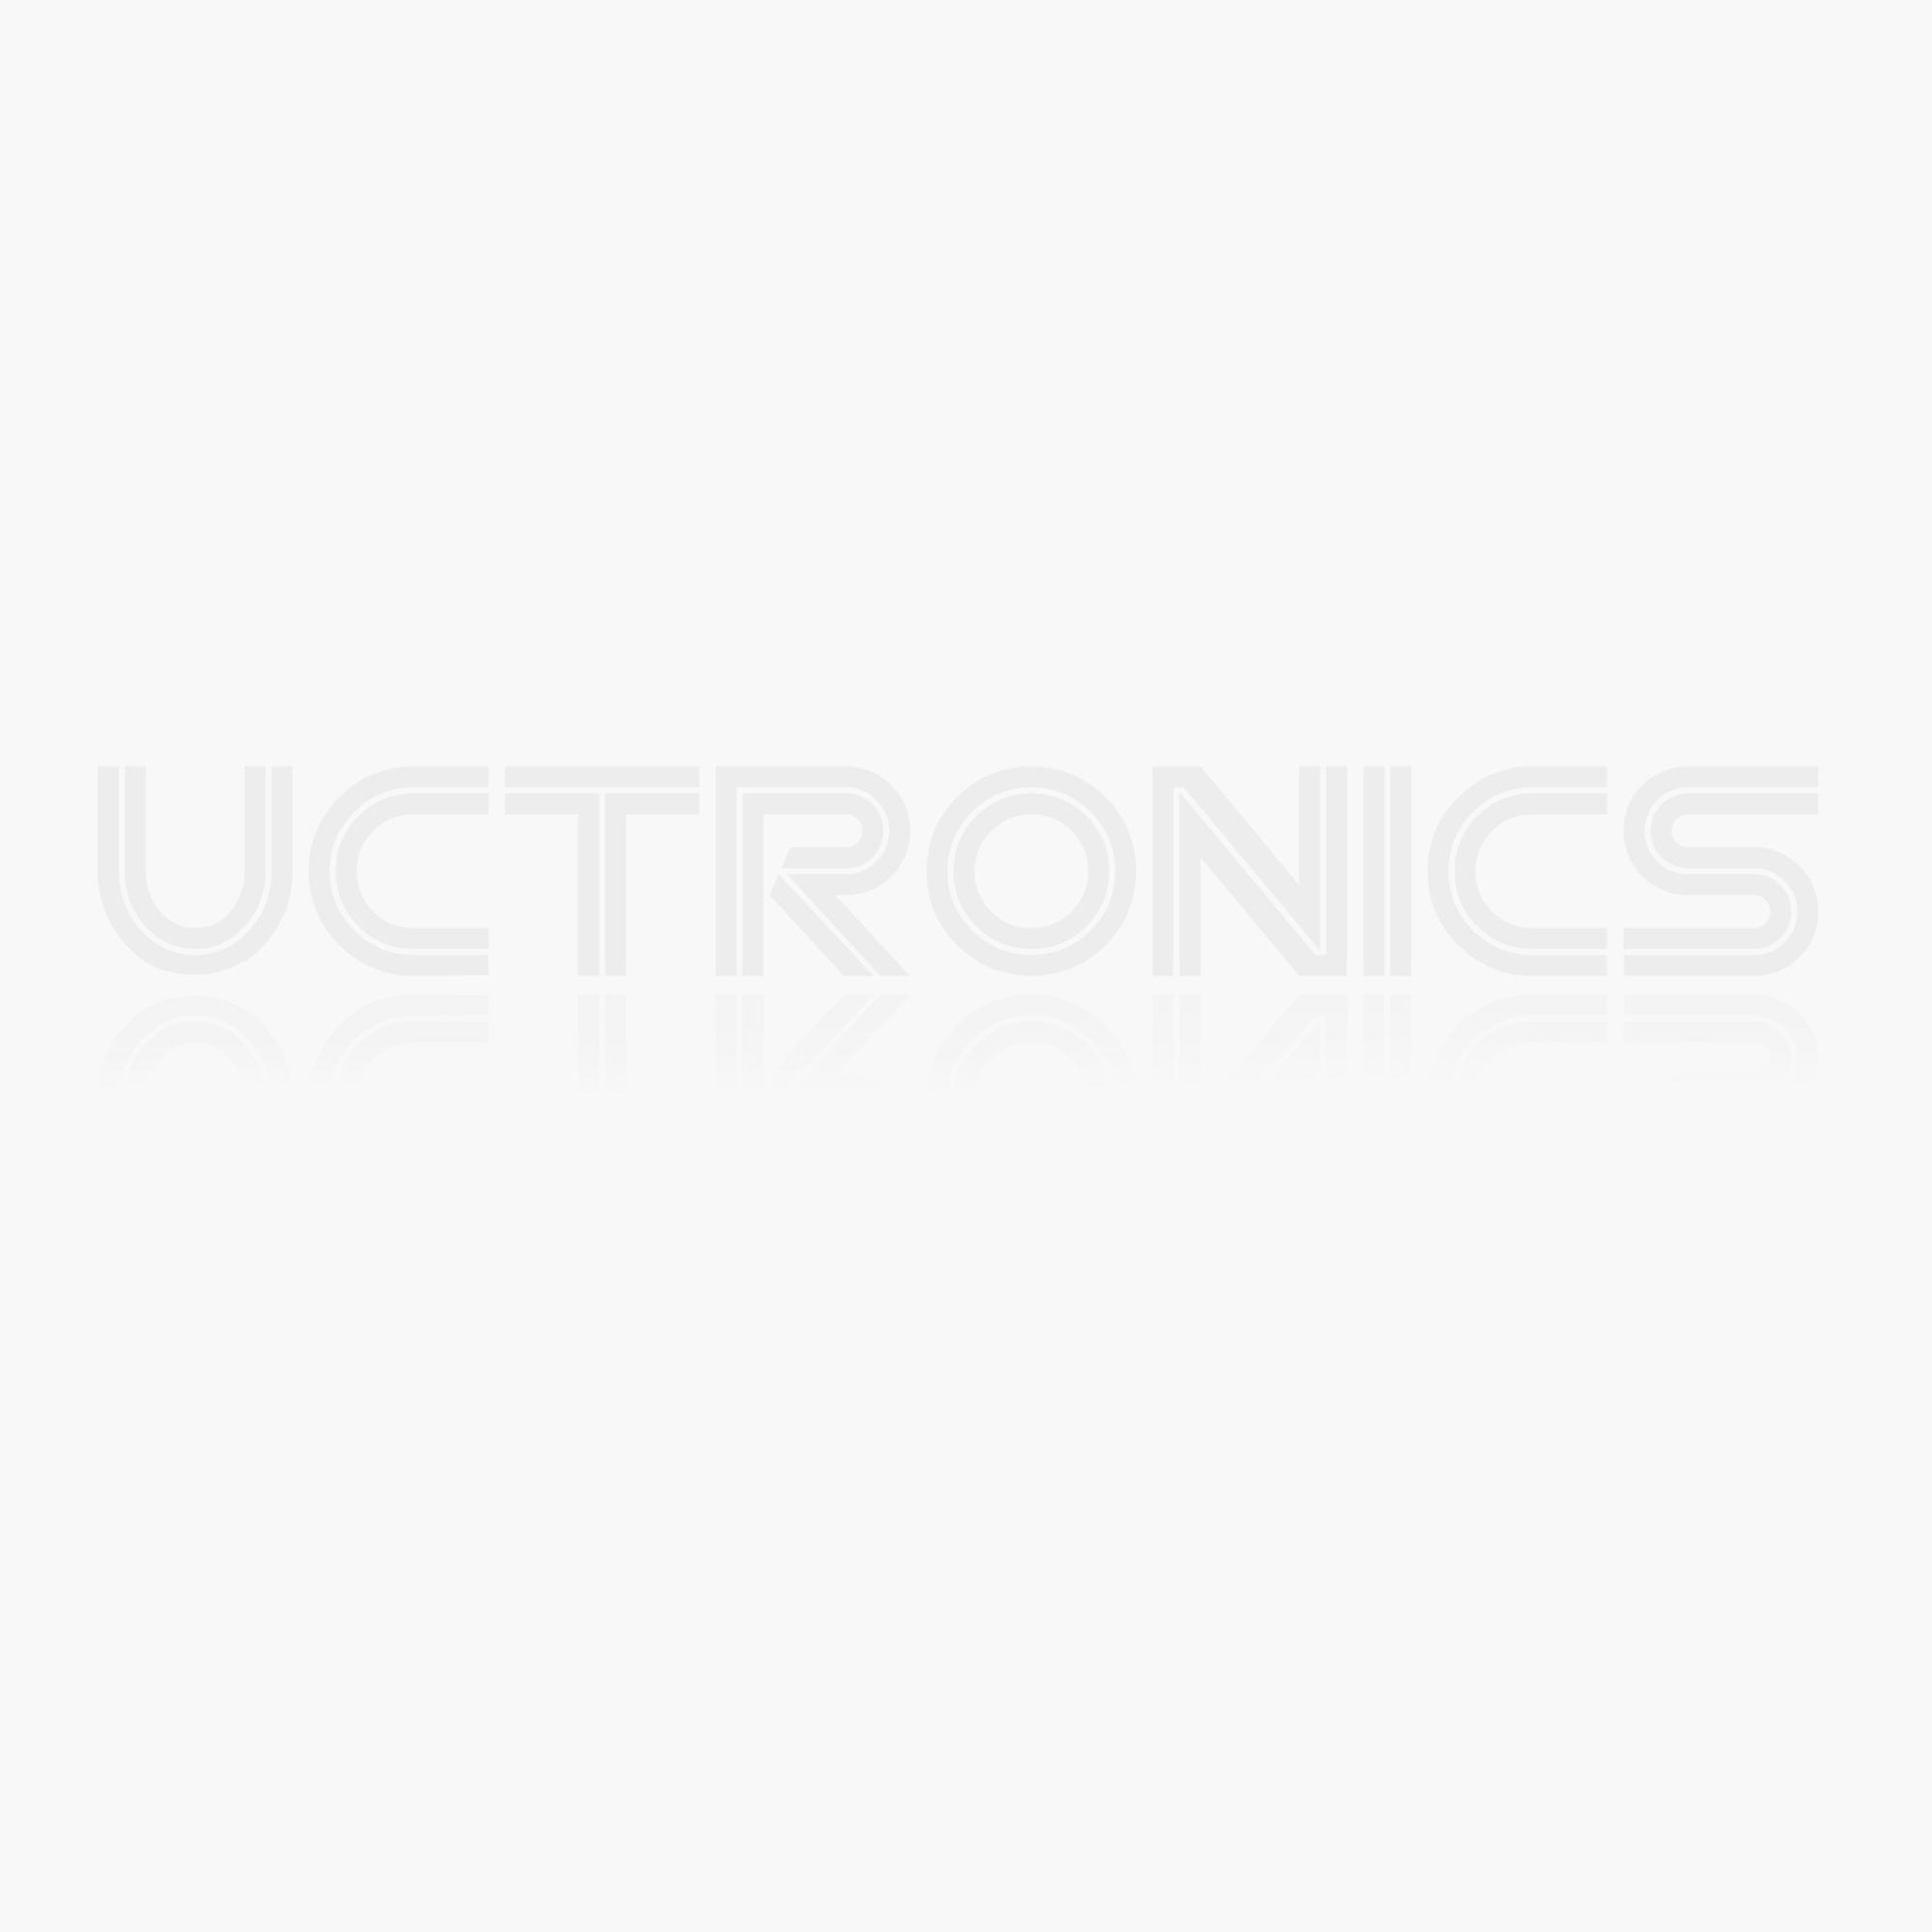 10pcs 2x5 10pin IDC Socket Box Male Header Connector Straight